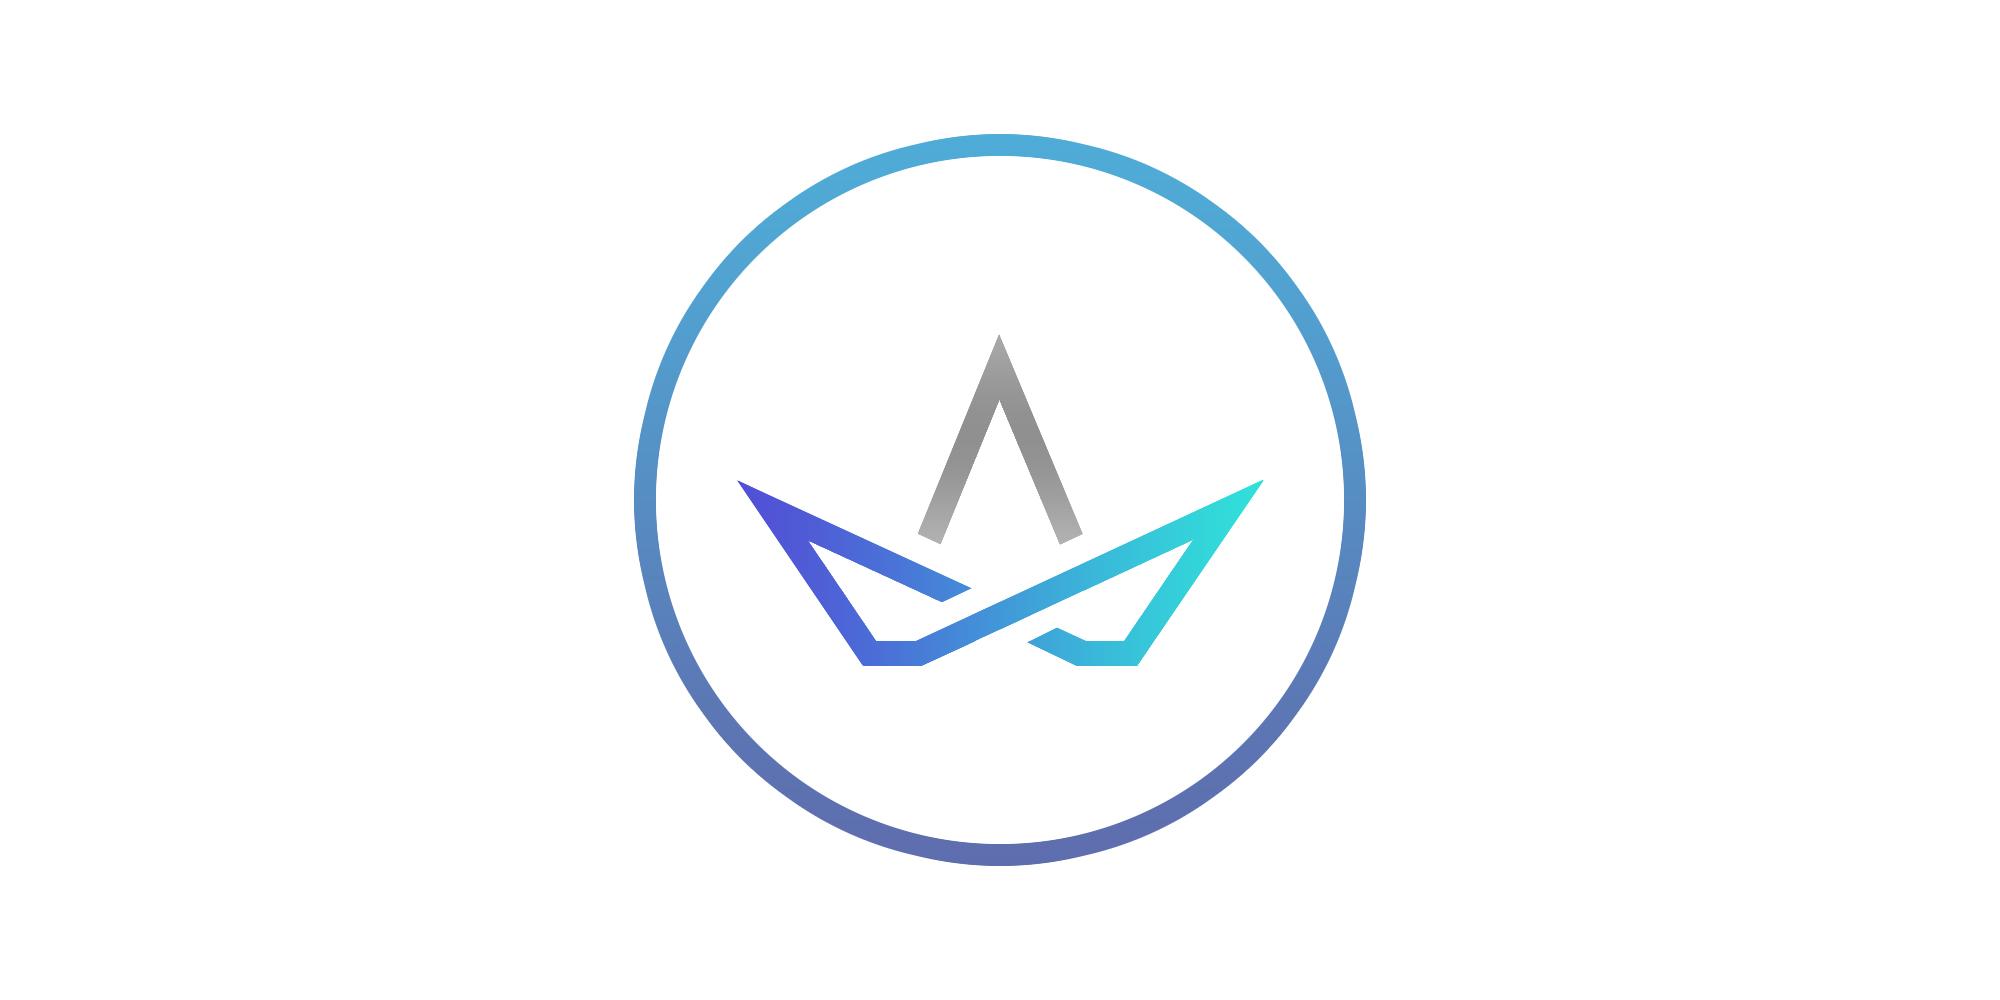 логотип академика